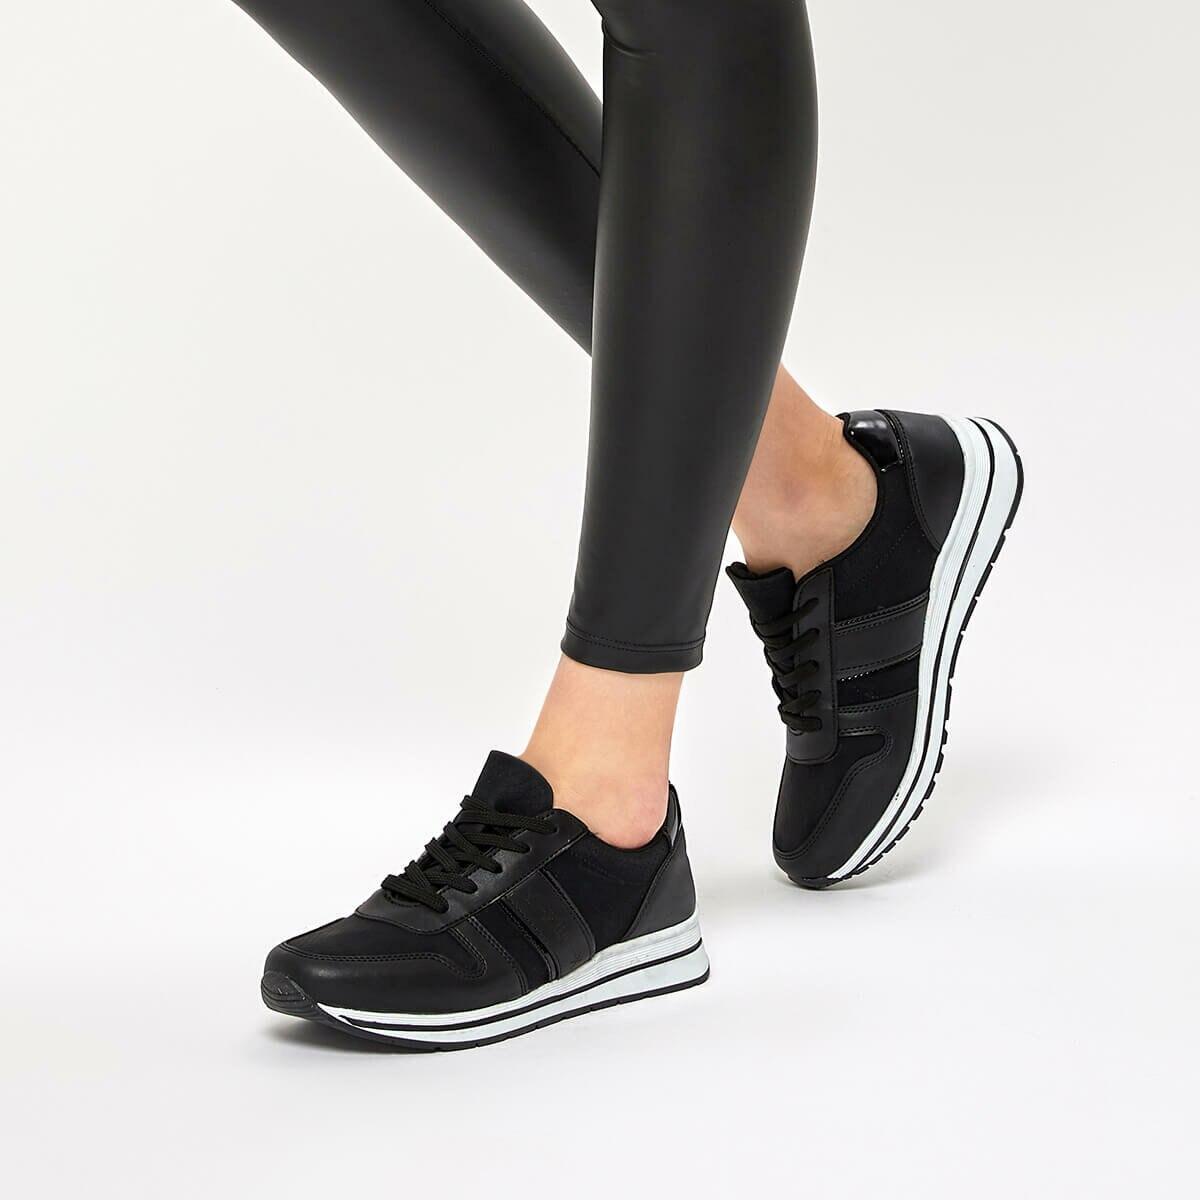 FLO ALESS 9PR Black Women 'S Sneaker Shoes KINETIX